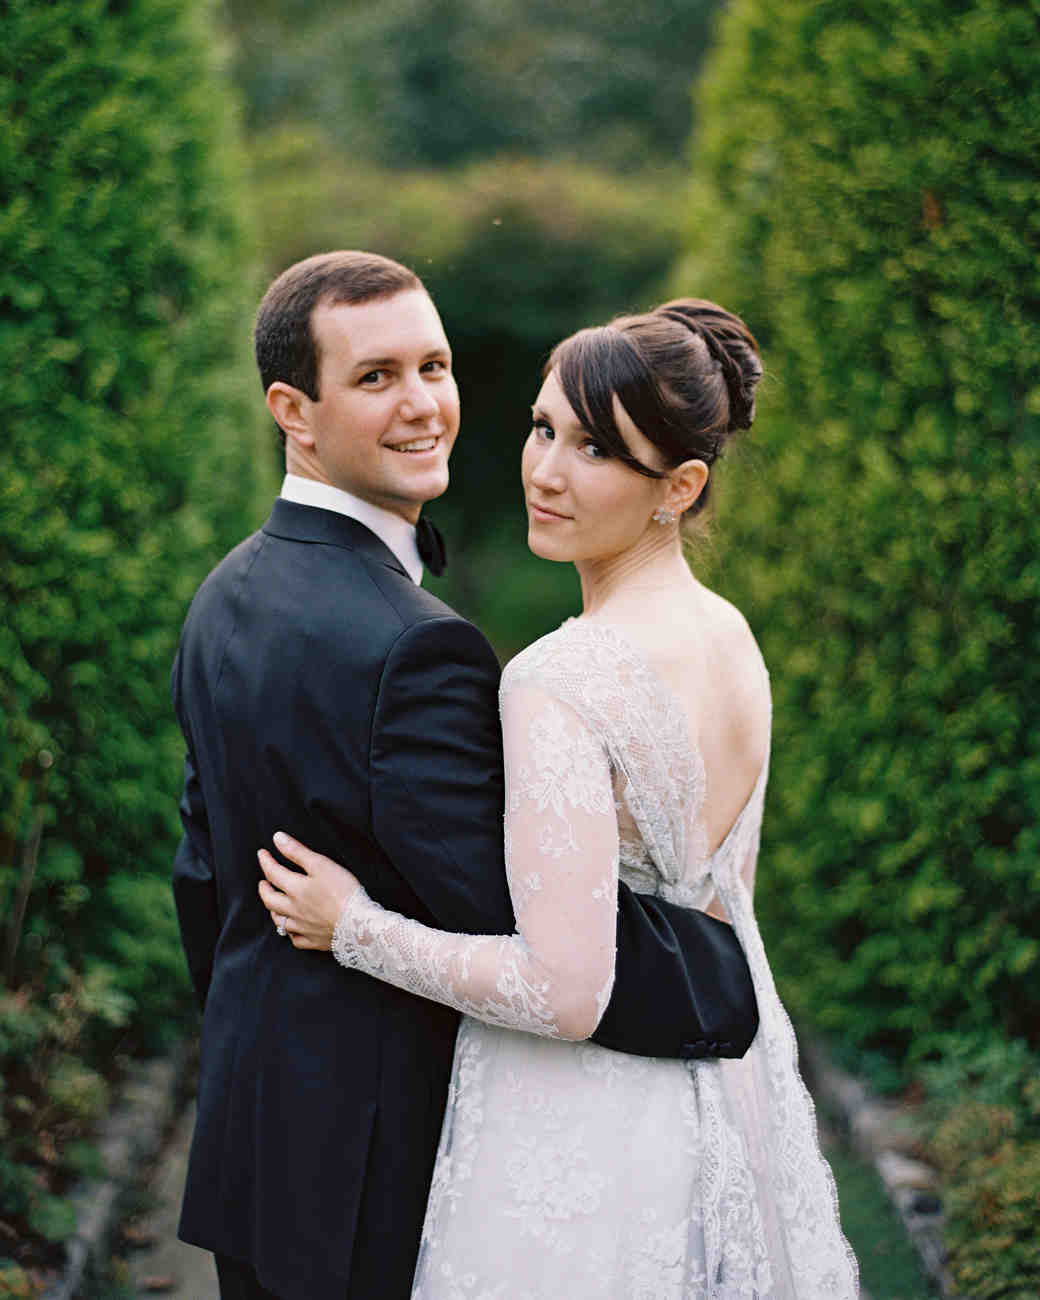 sarah-david-wedding-couple-0414.jpg